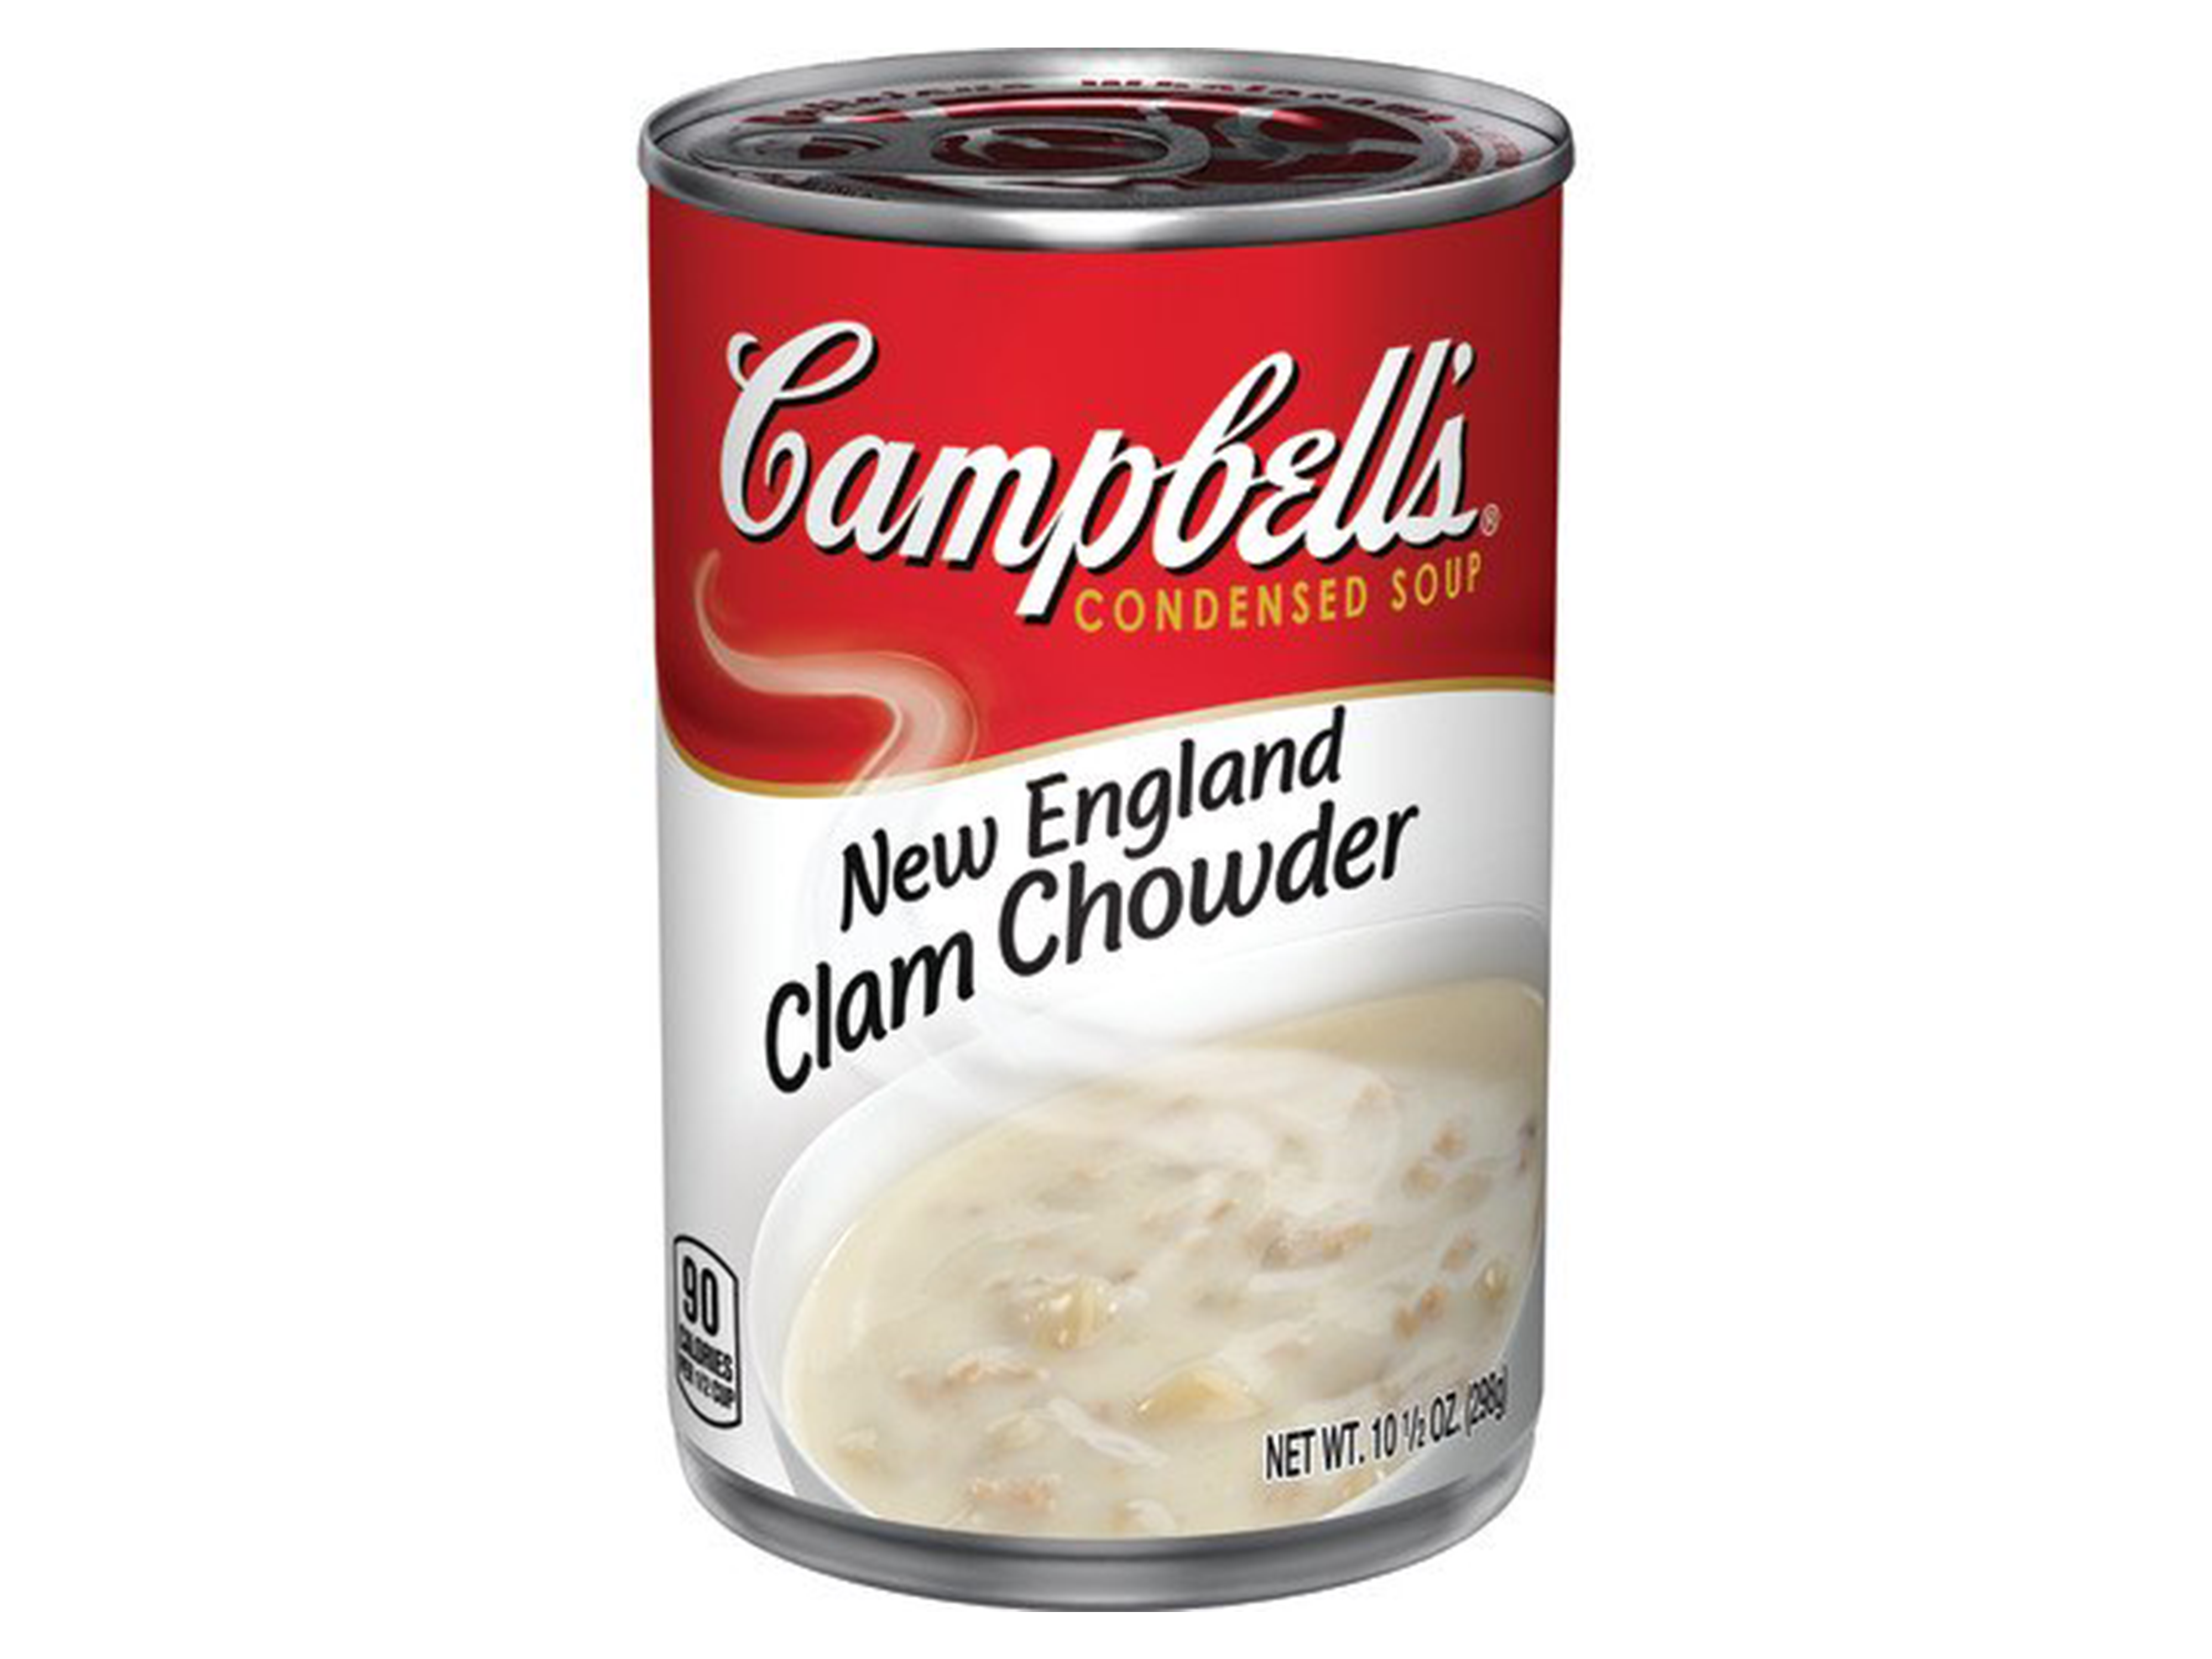 campbells-clam-chowder